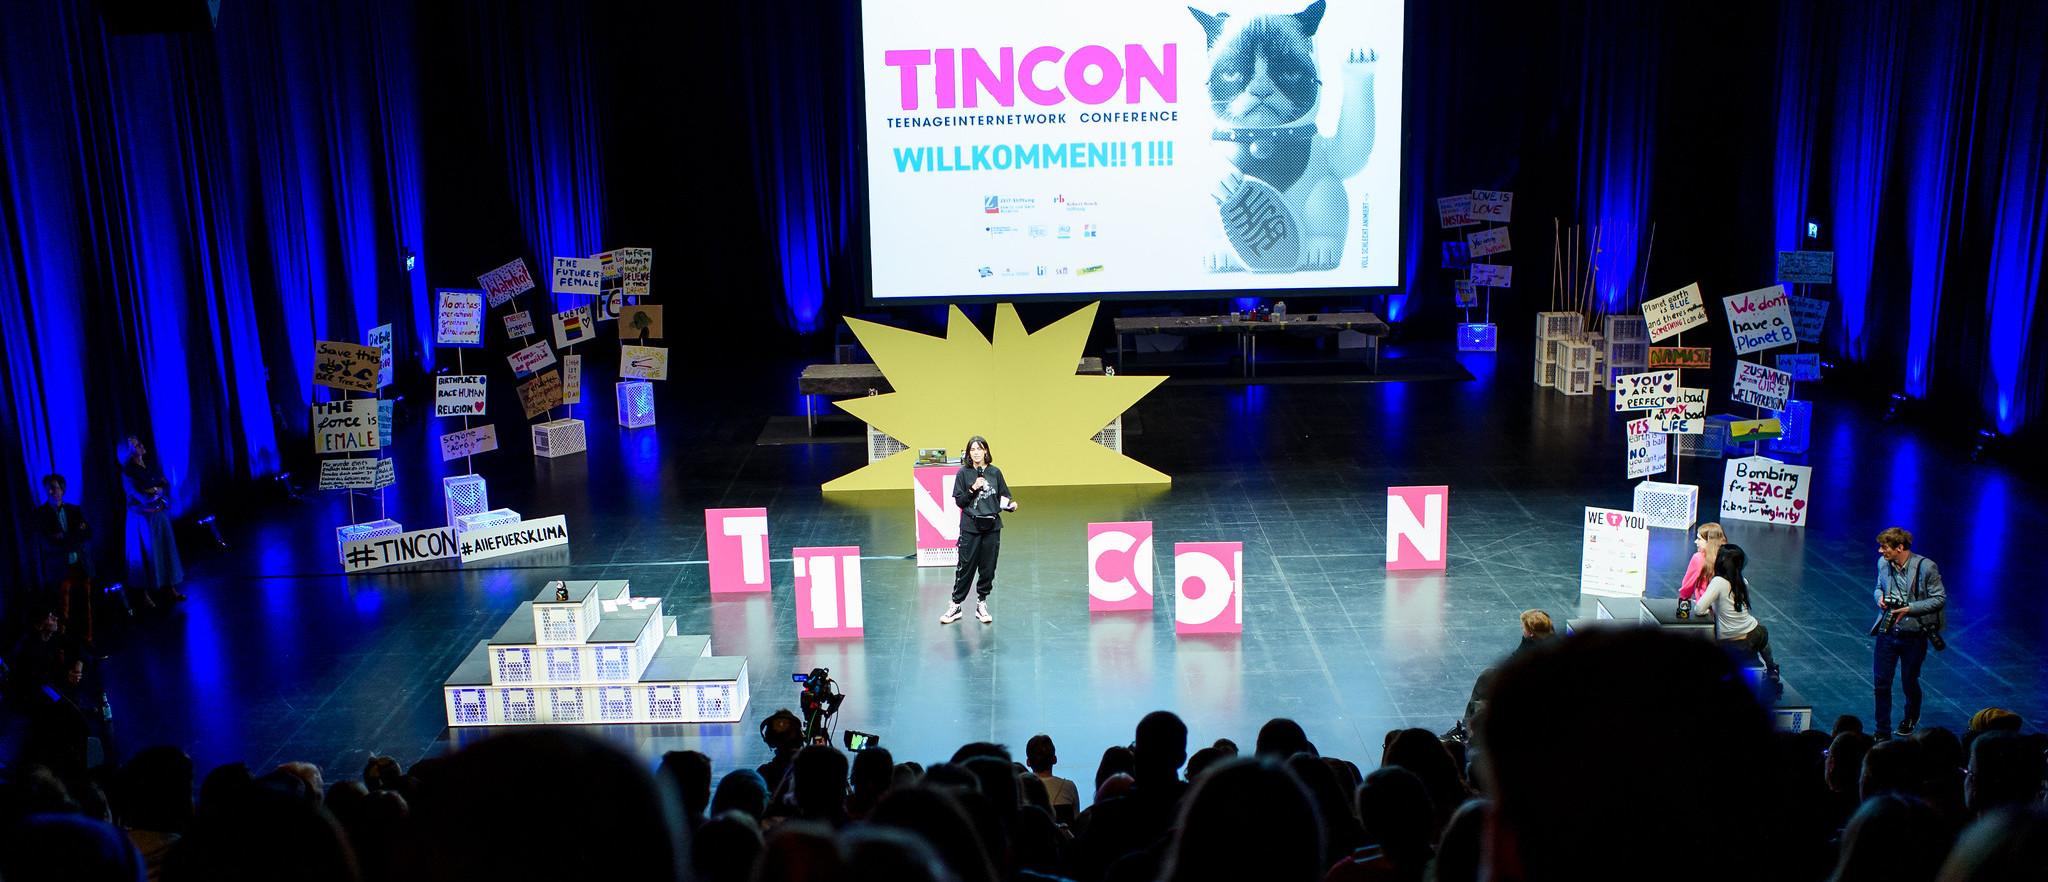 TINCON Hamburg 2019 - Eröffnung